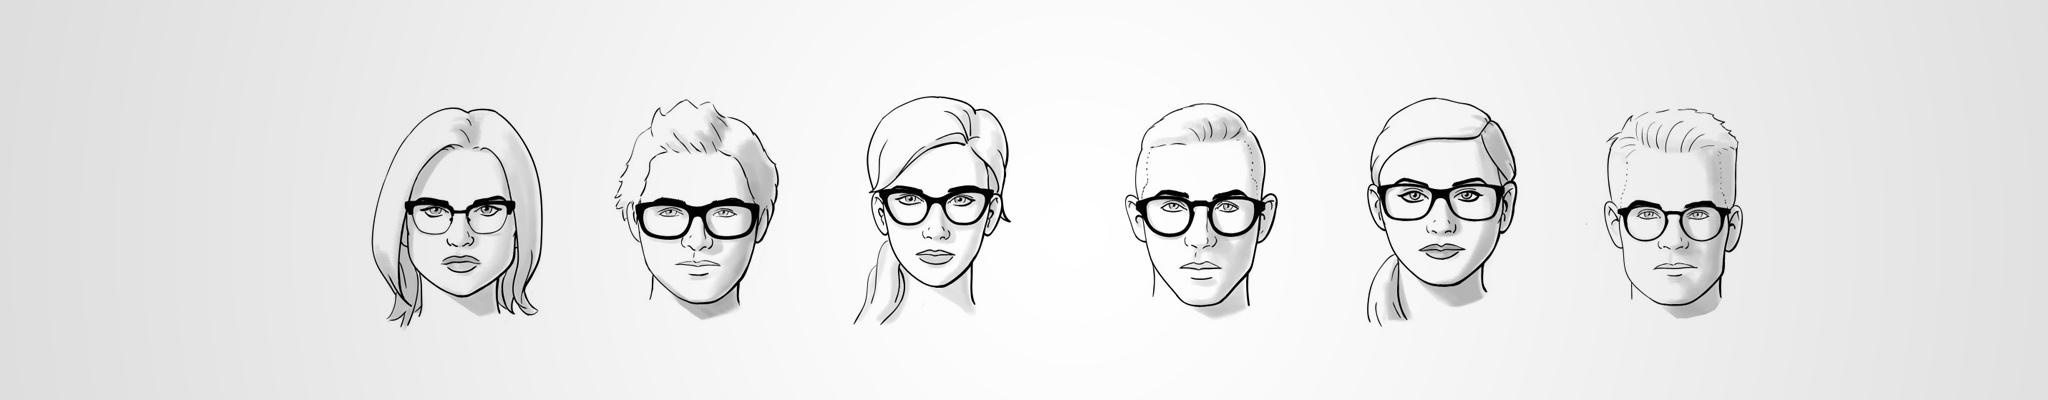 consulenti occhiali frames advisor